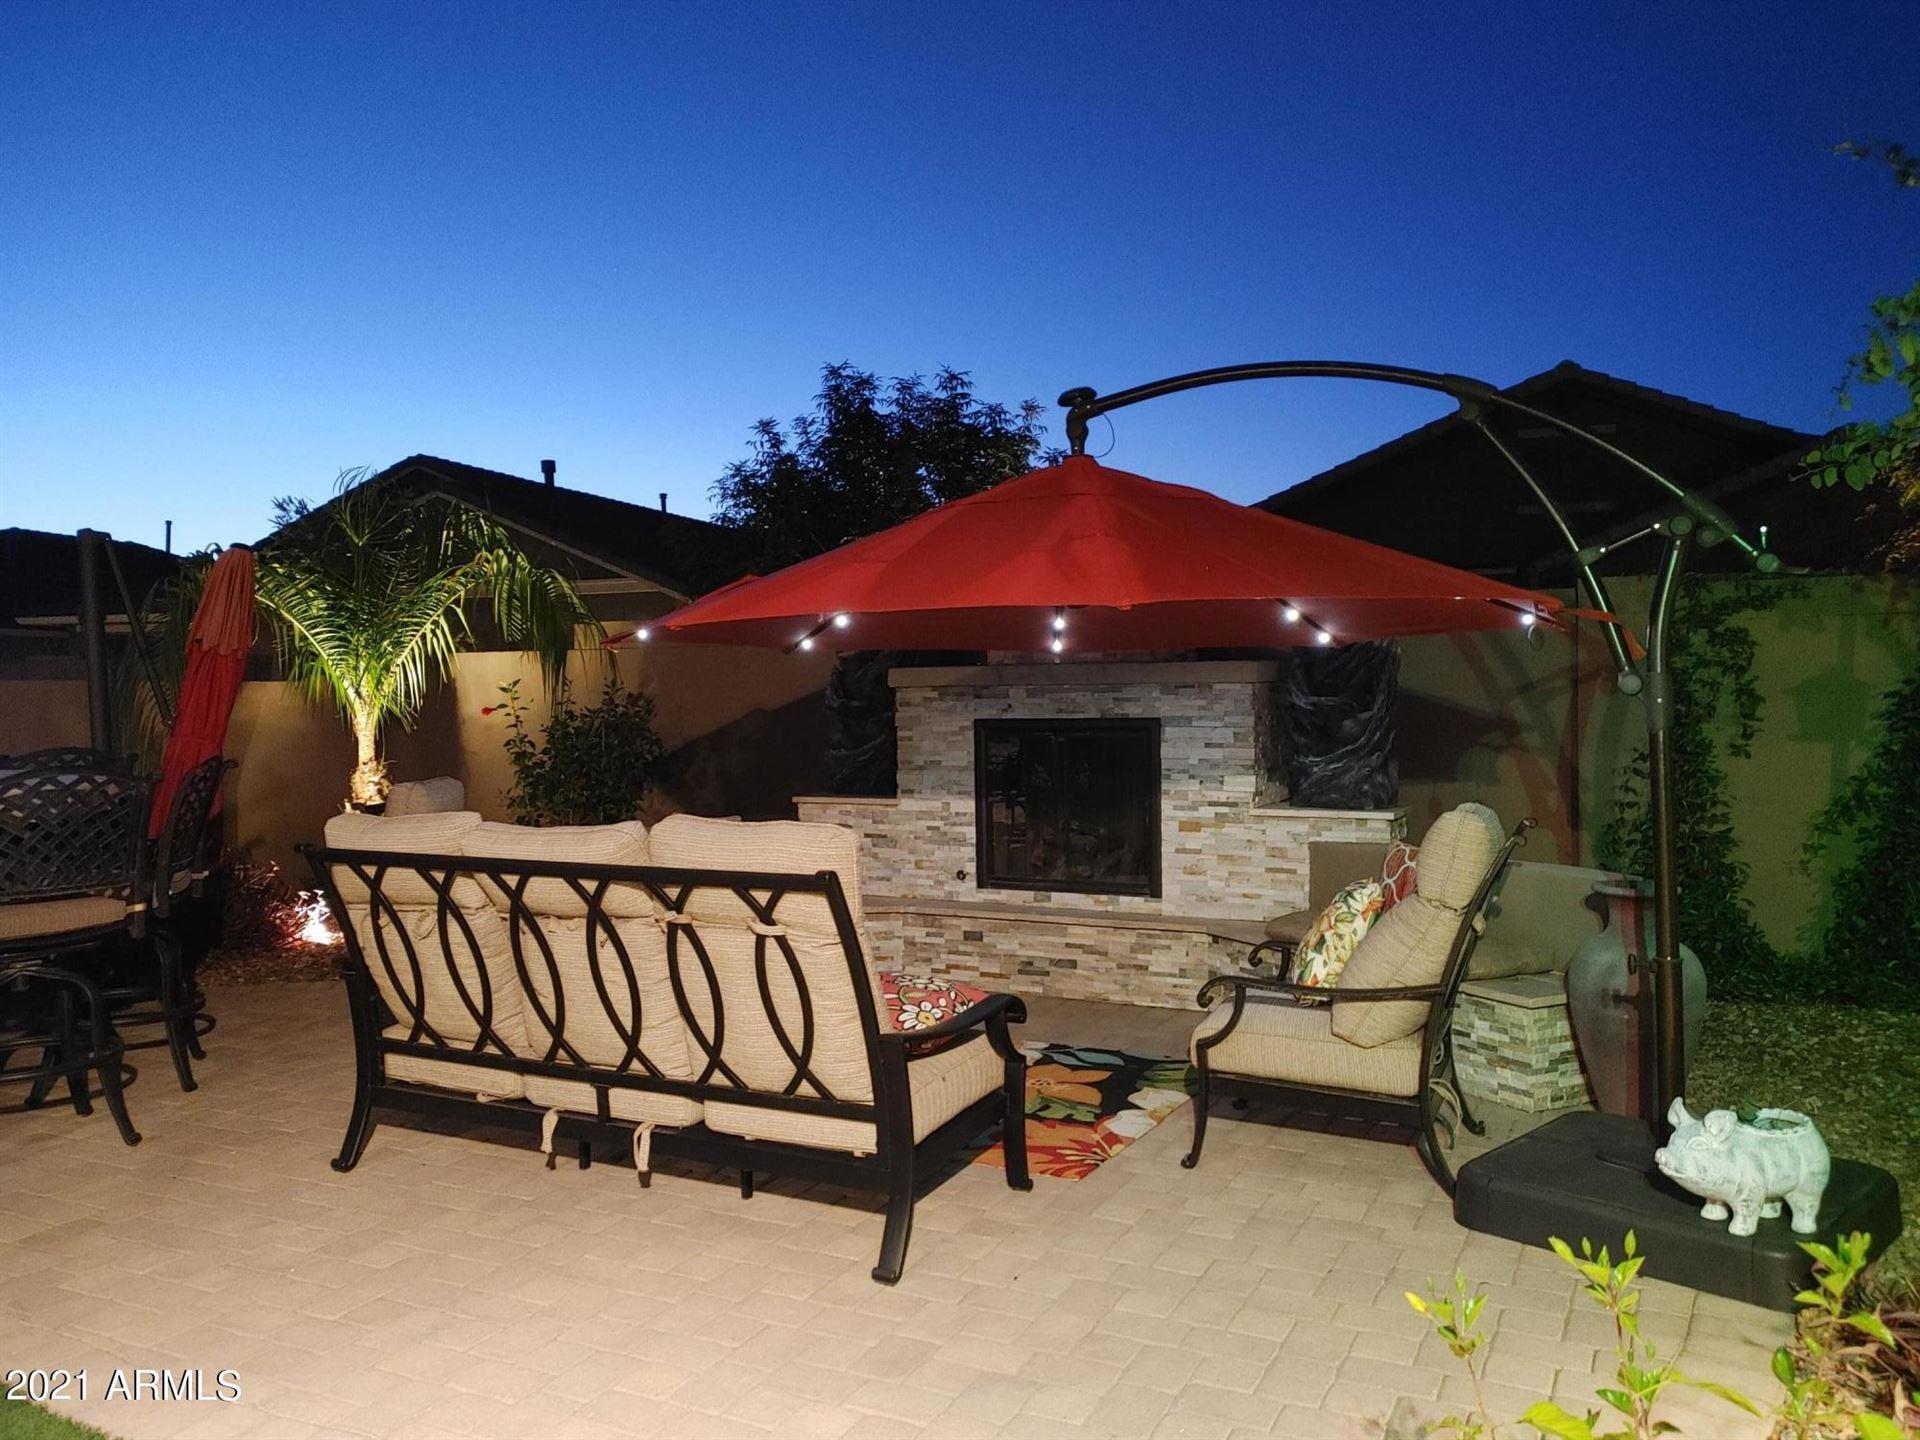 Photo of 20480 E CARRIAGE Way, Queen Creek, AZ 85142 (MLS # 6229808)